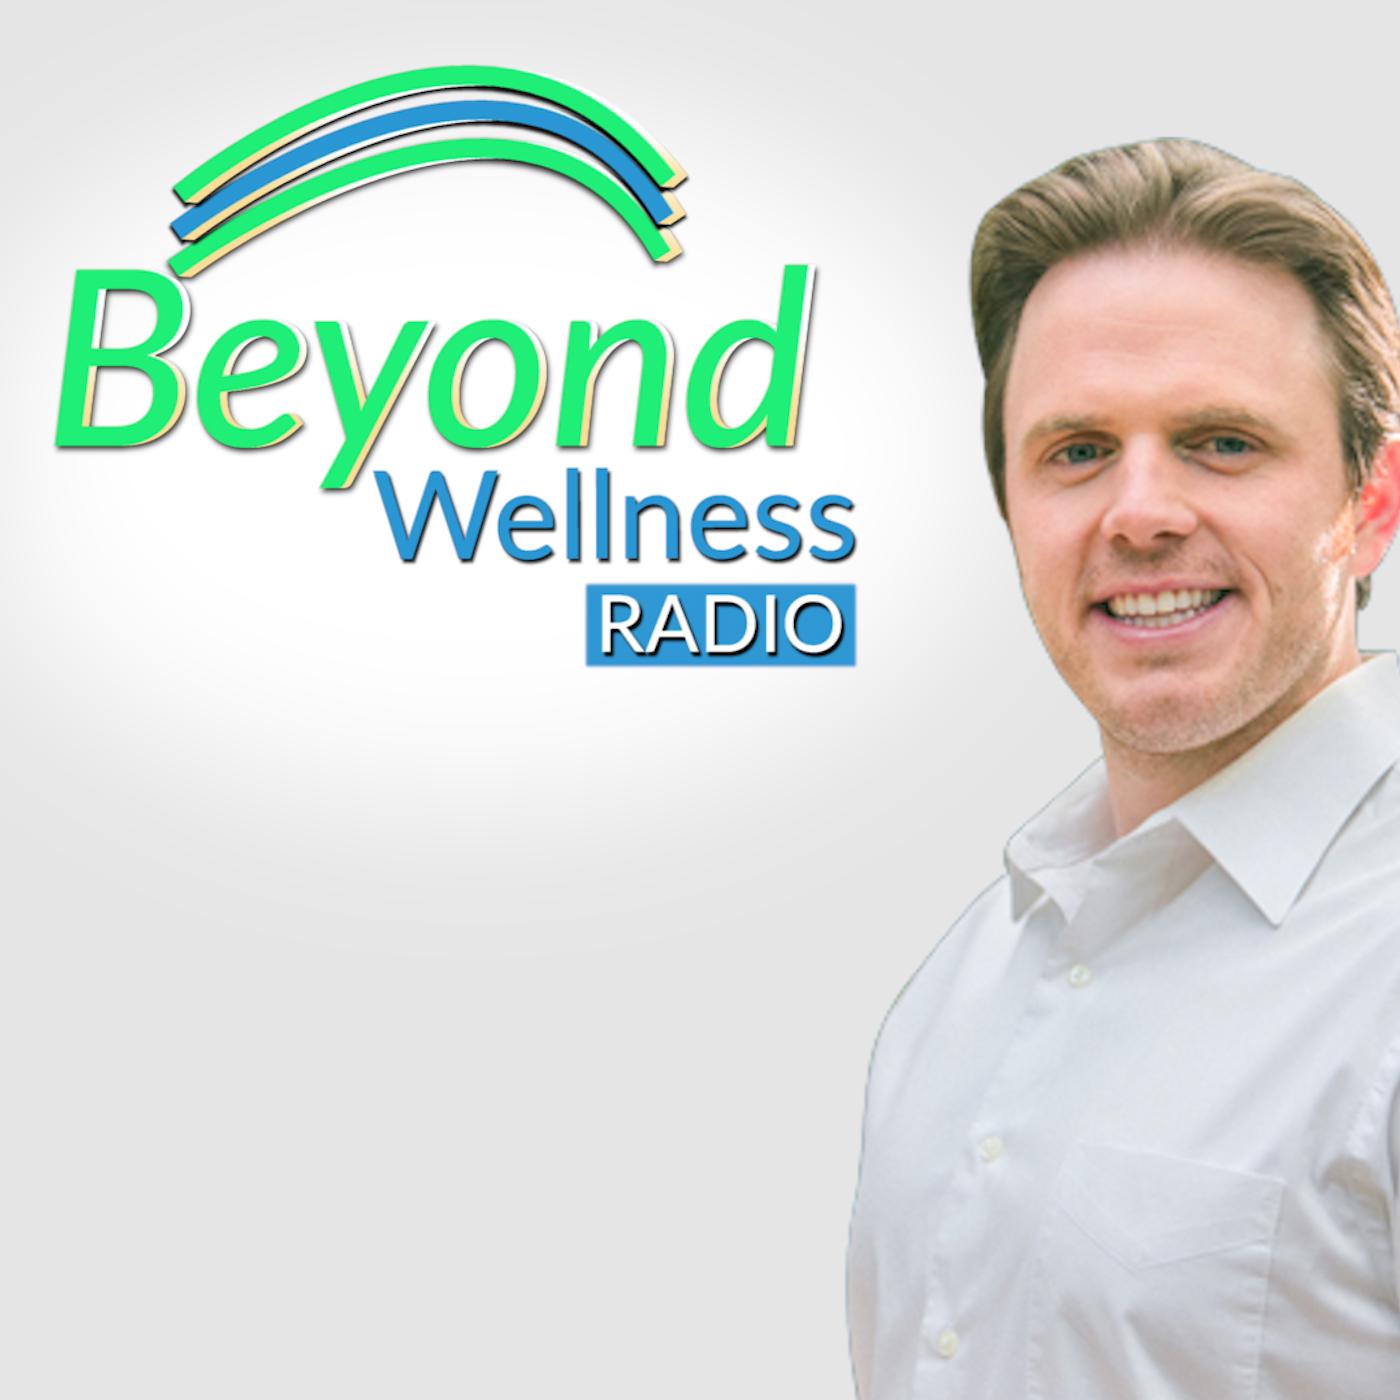 Beyond Wellness Radio